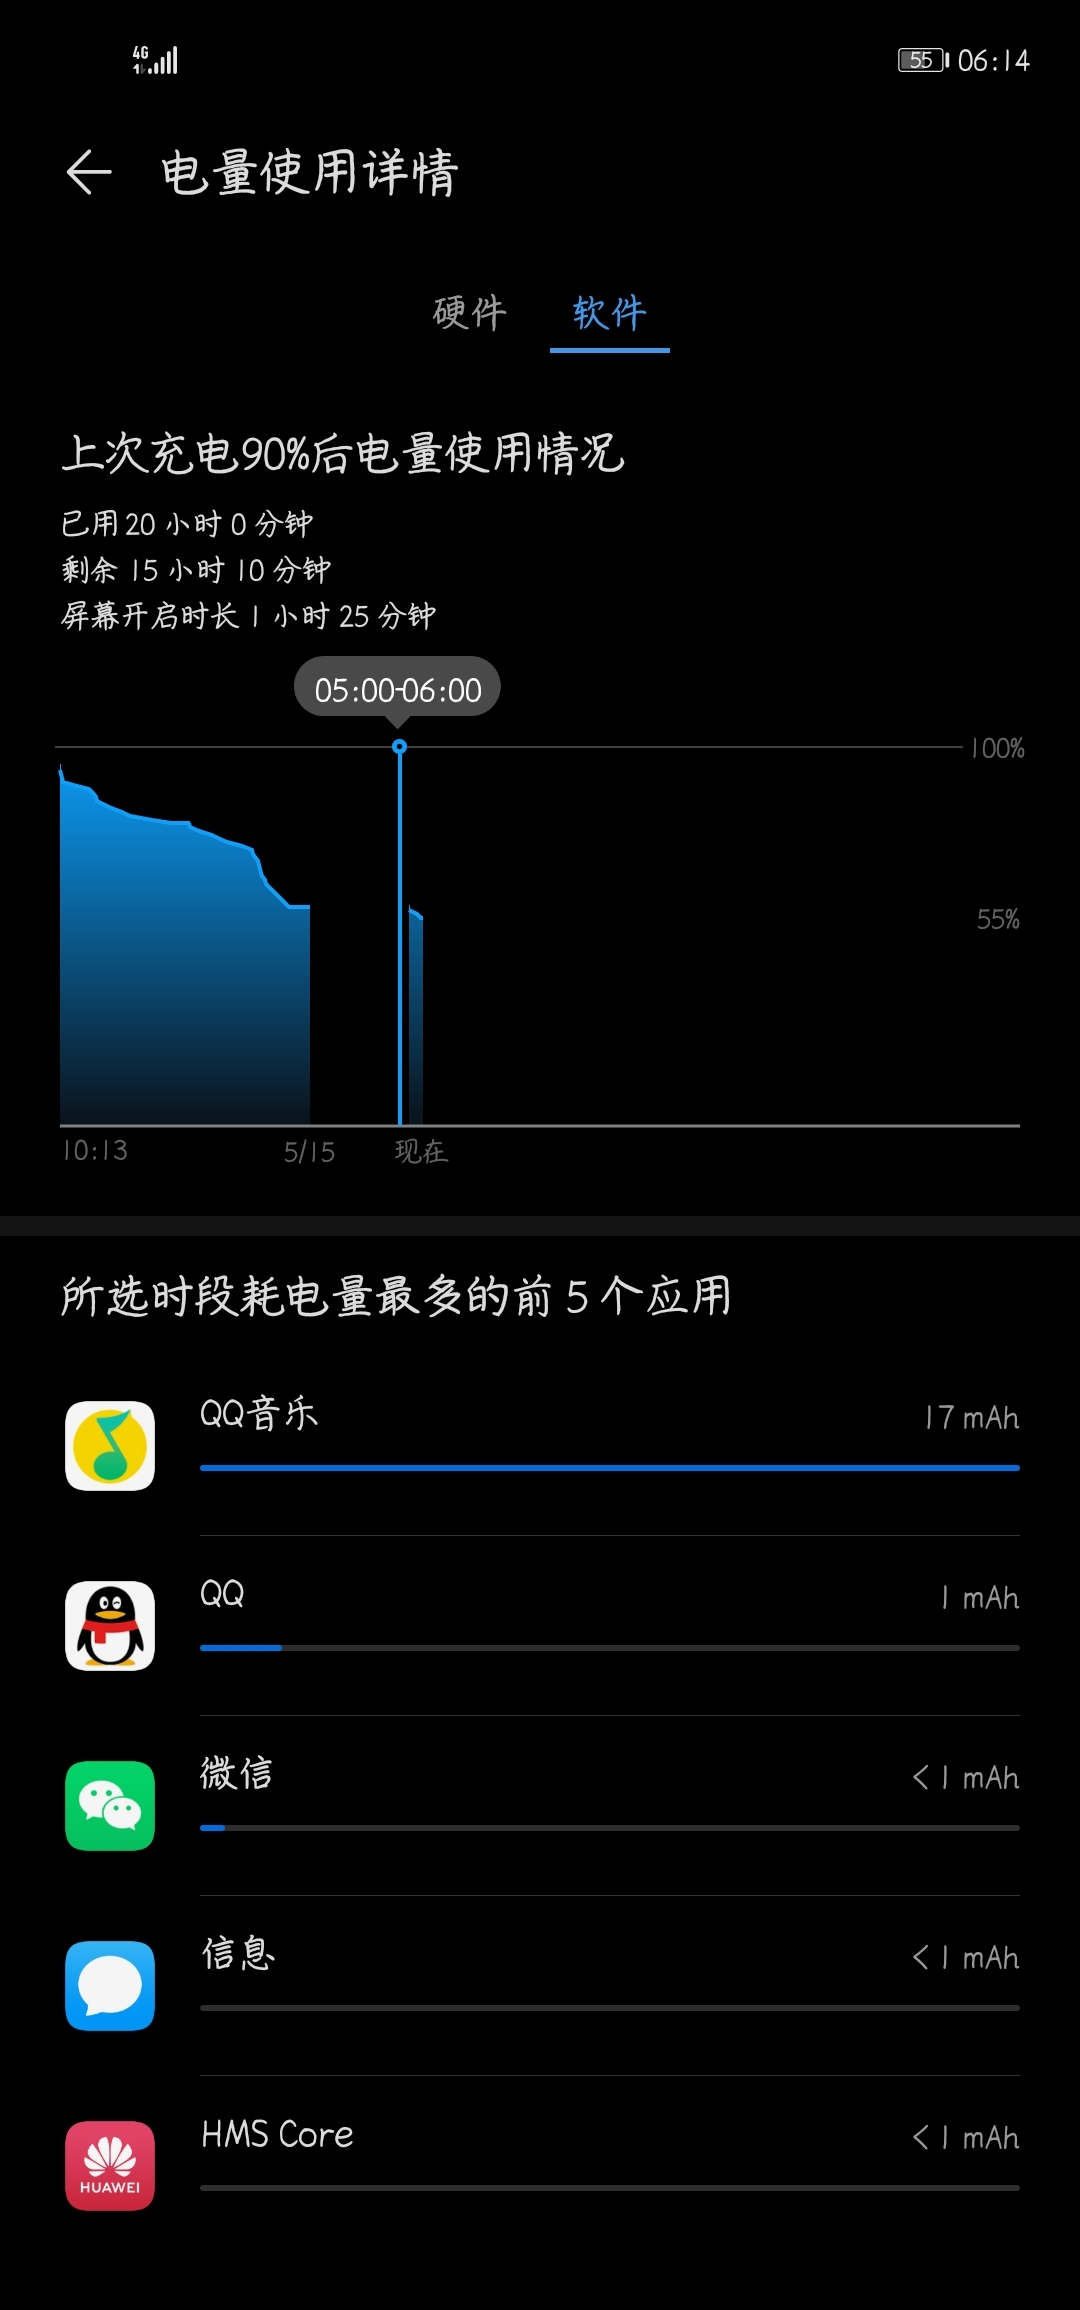 Screenshot_20200515_061456_com.huawei.systemmanager.jpg